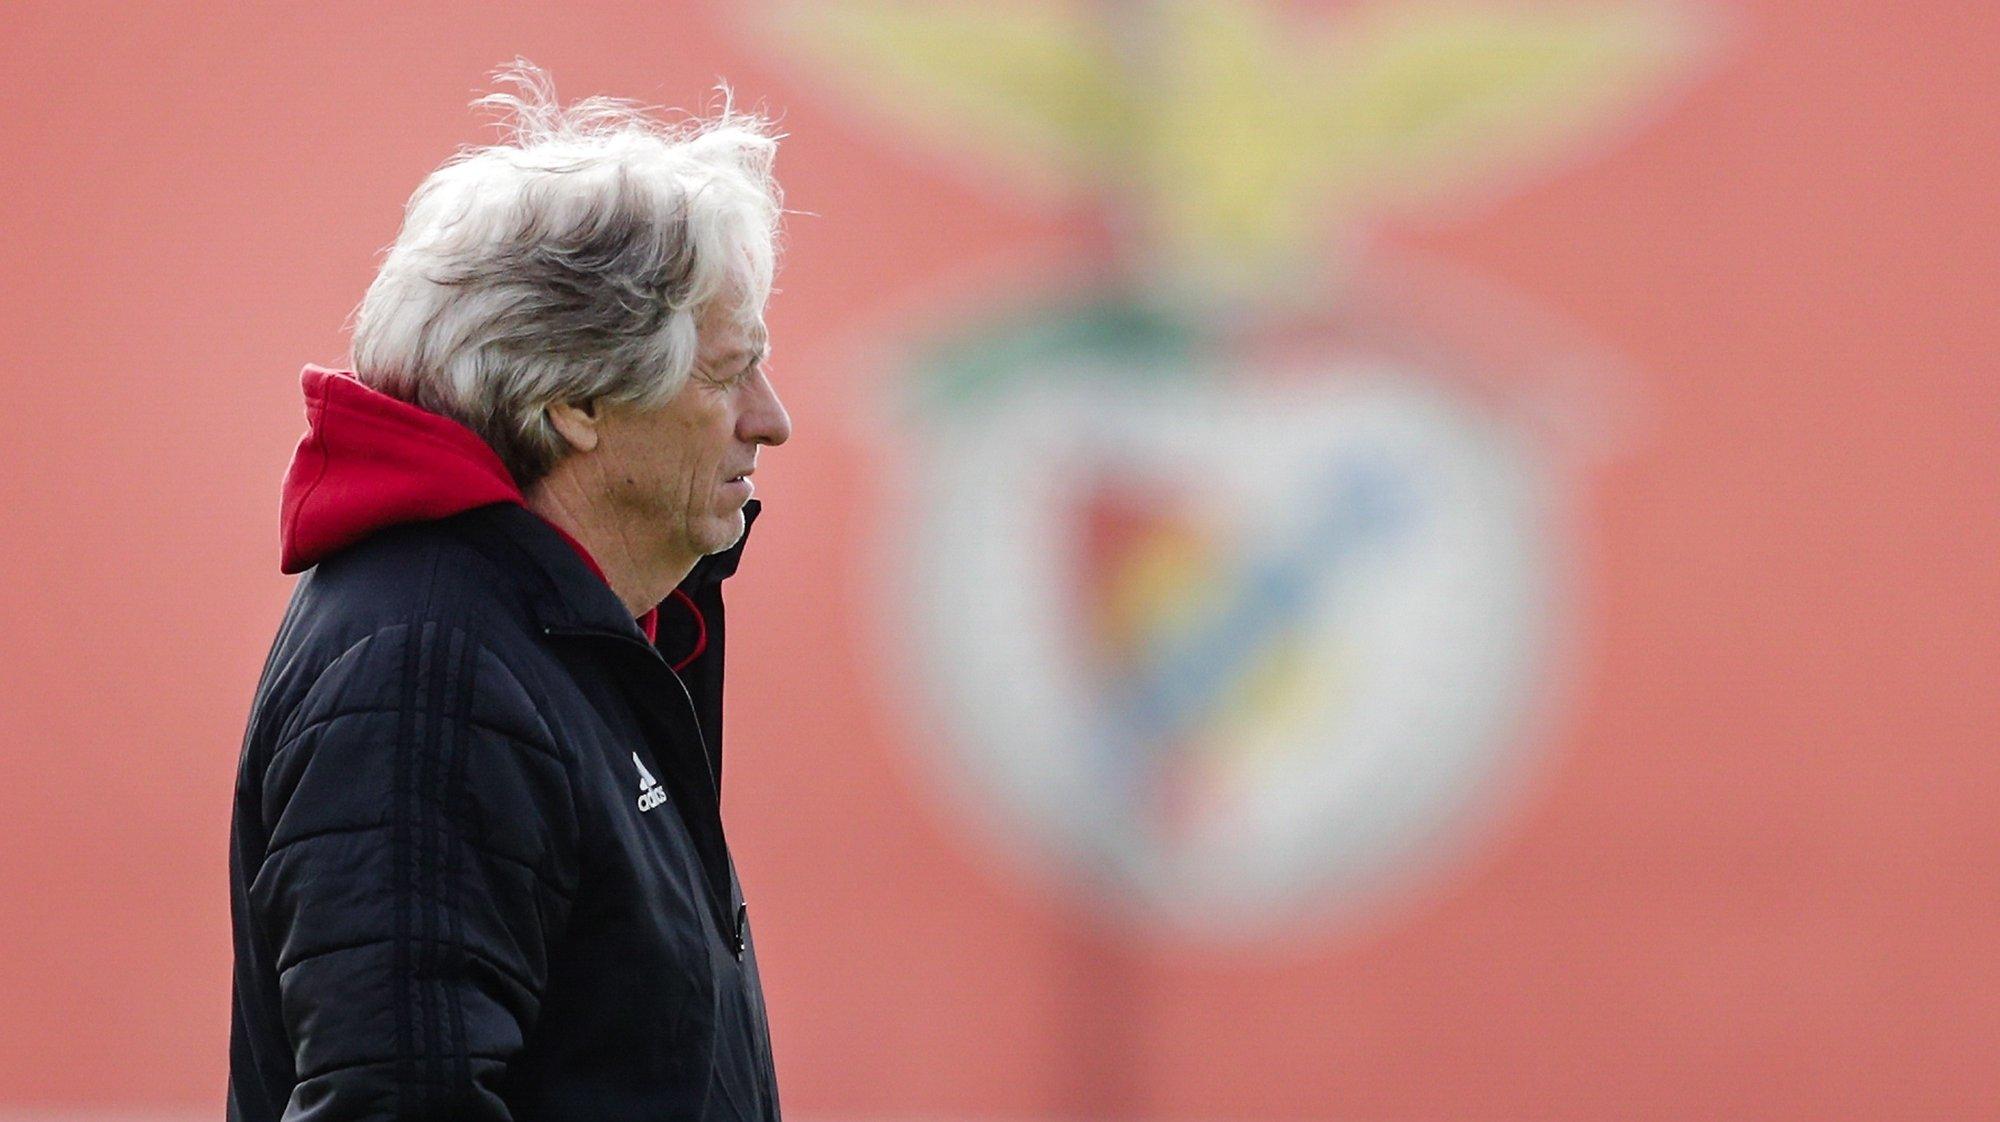 epa09018321 Benfica's head coach Jorge Jesus leads a training session on the upcoming UEFA Europa League match against Arsenal, at Seixal training center on the outskirts of Lisbon, Portugal, 17 February 2021.  EPA/TIAGO PETINGA